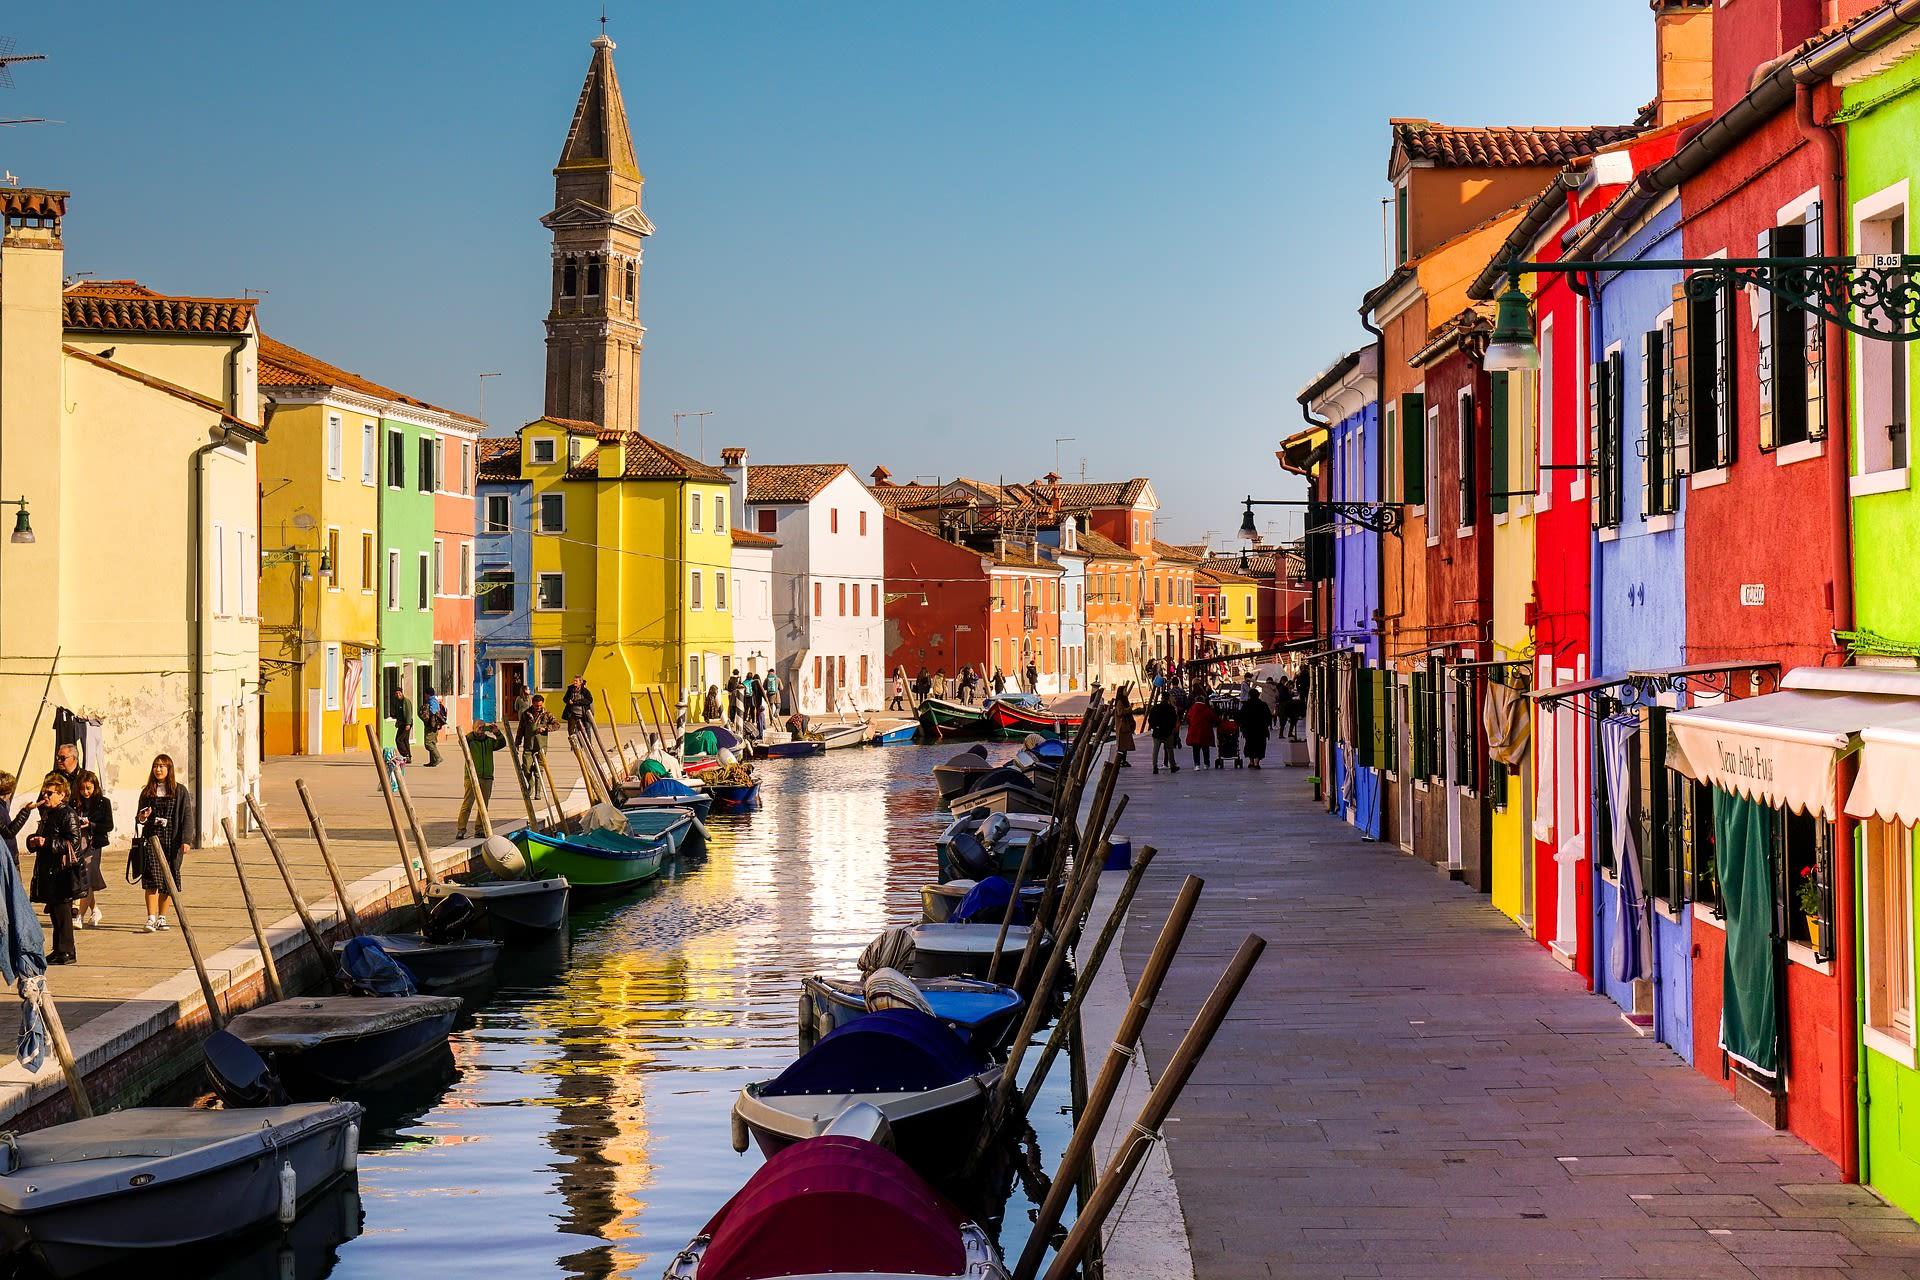 Veneto - Burano - The Colorful Island